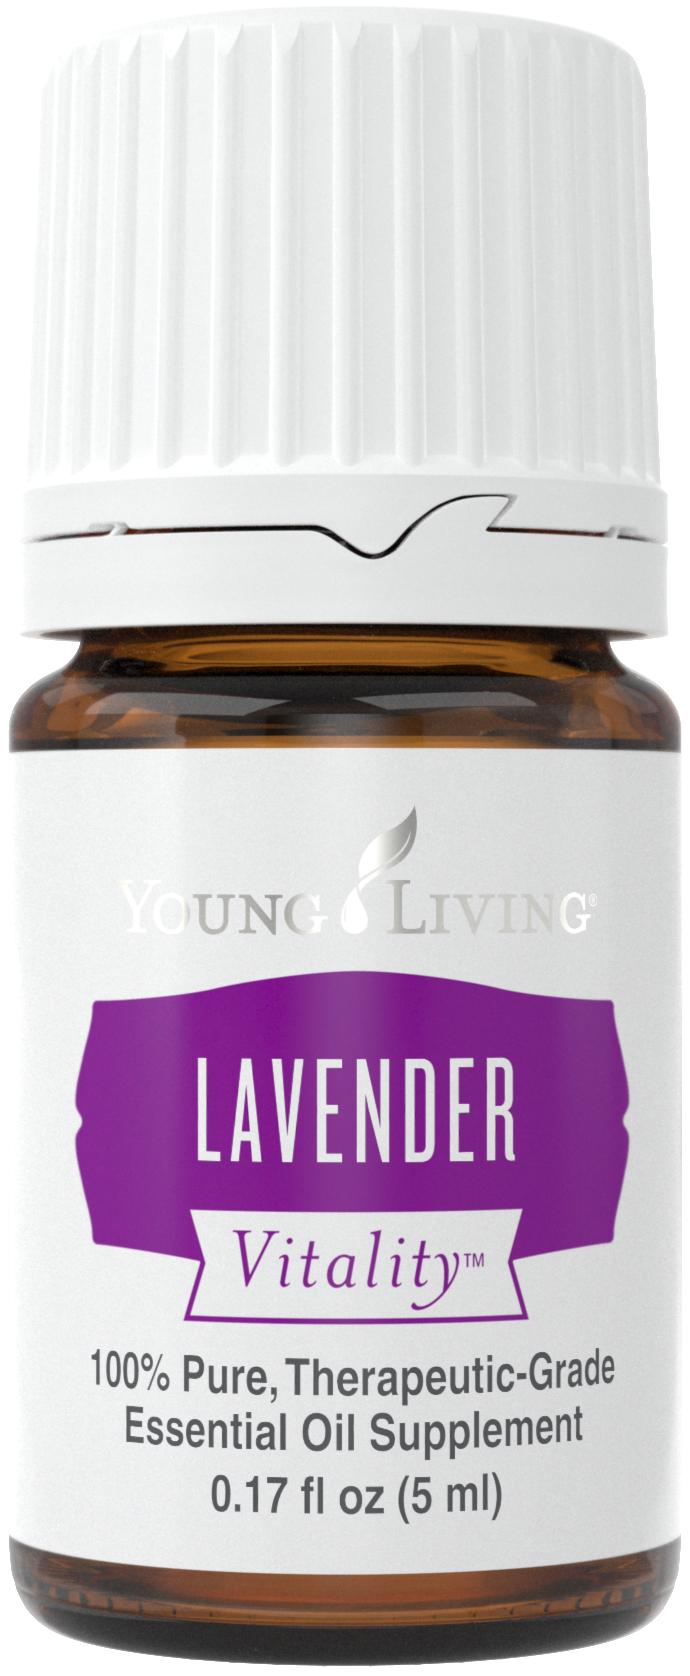 lavender vitality.png